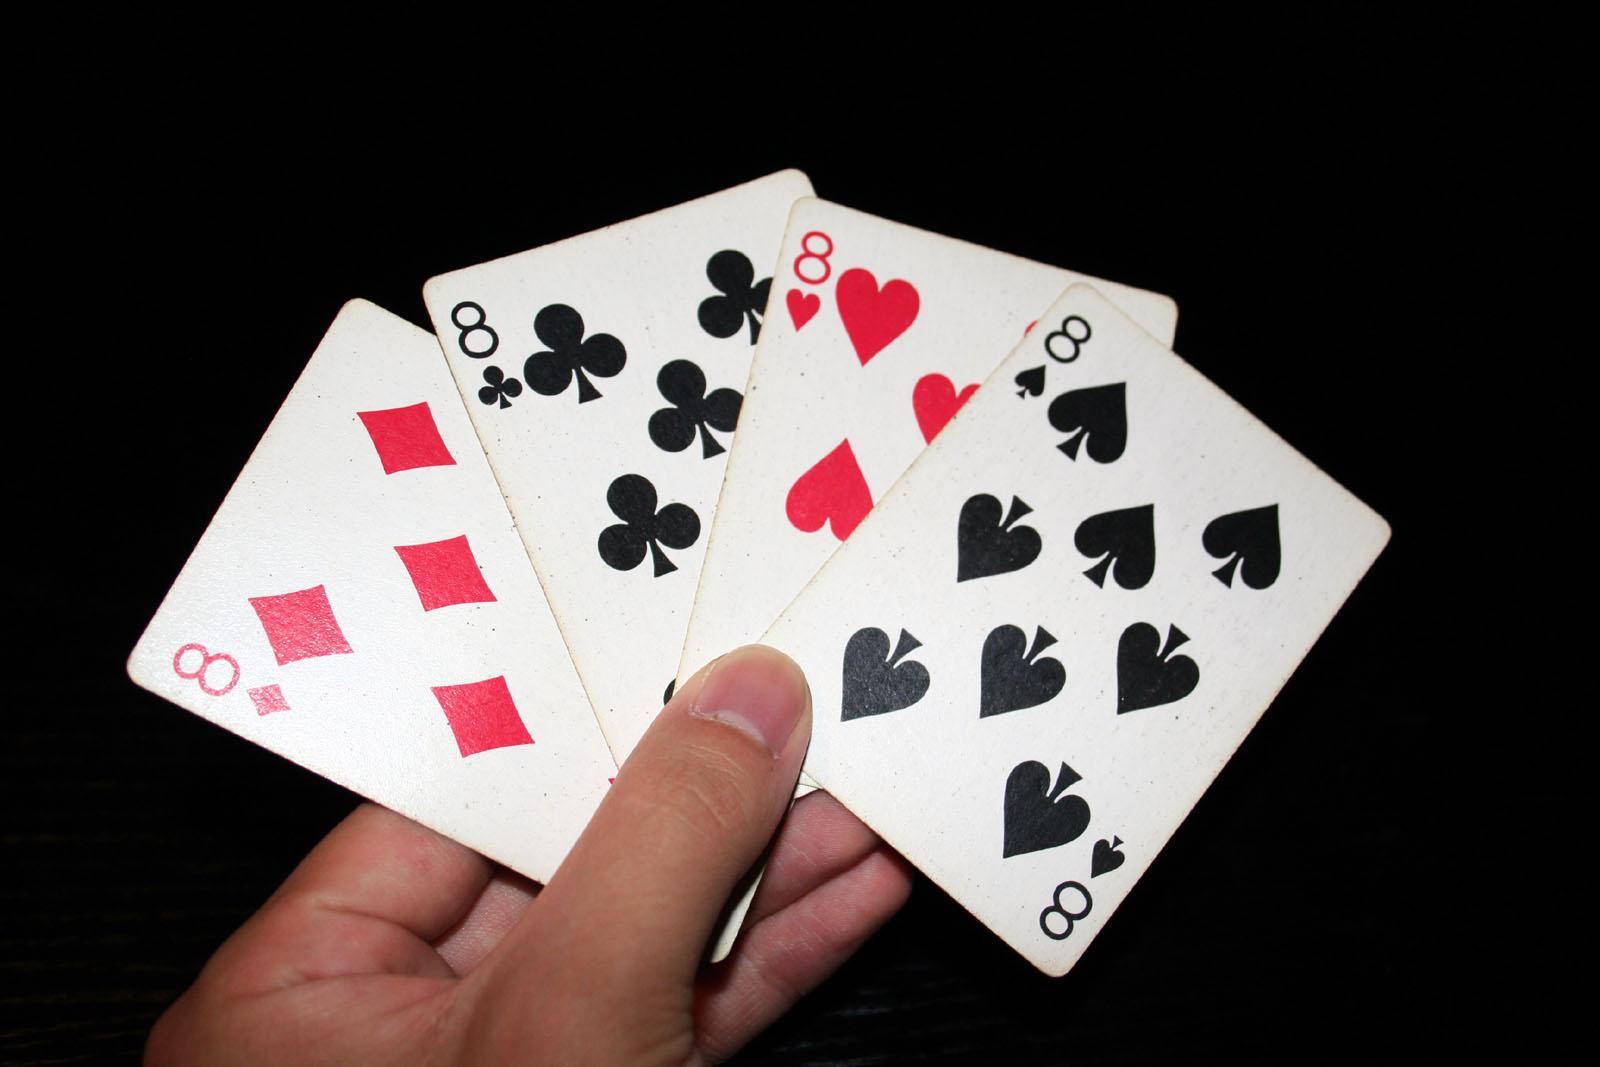 8 decks playing cards